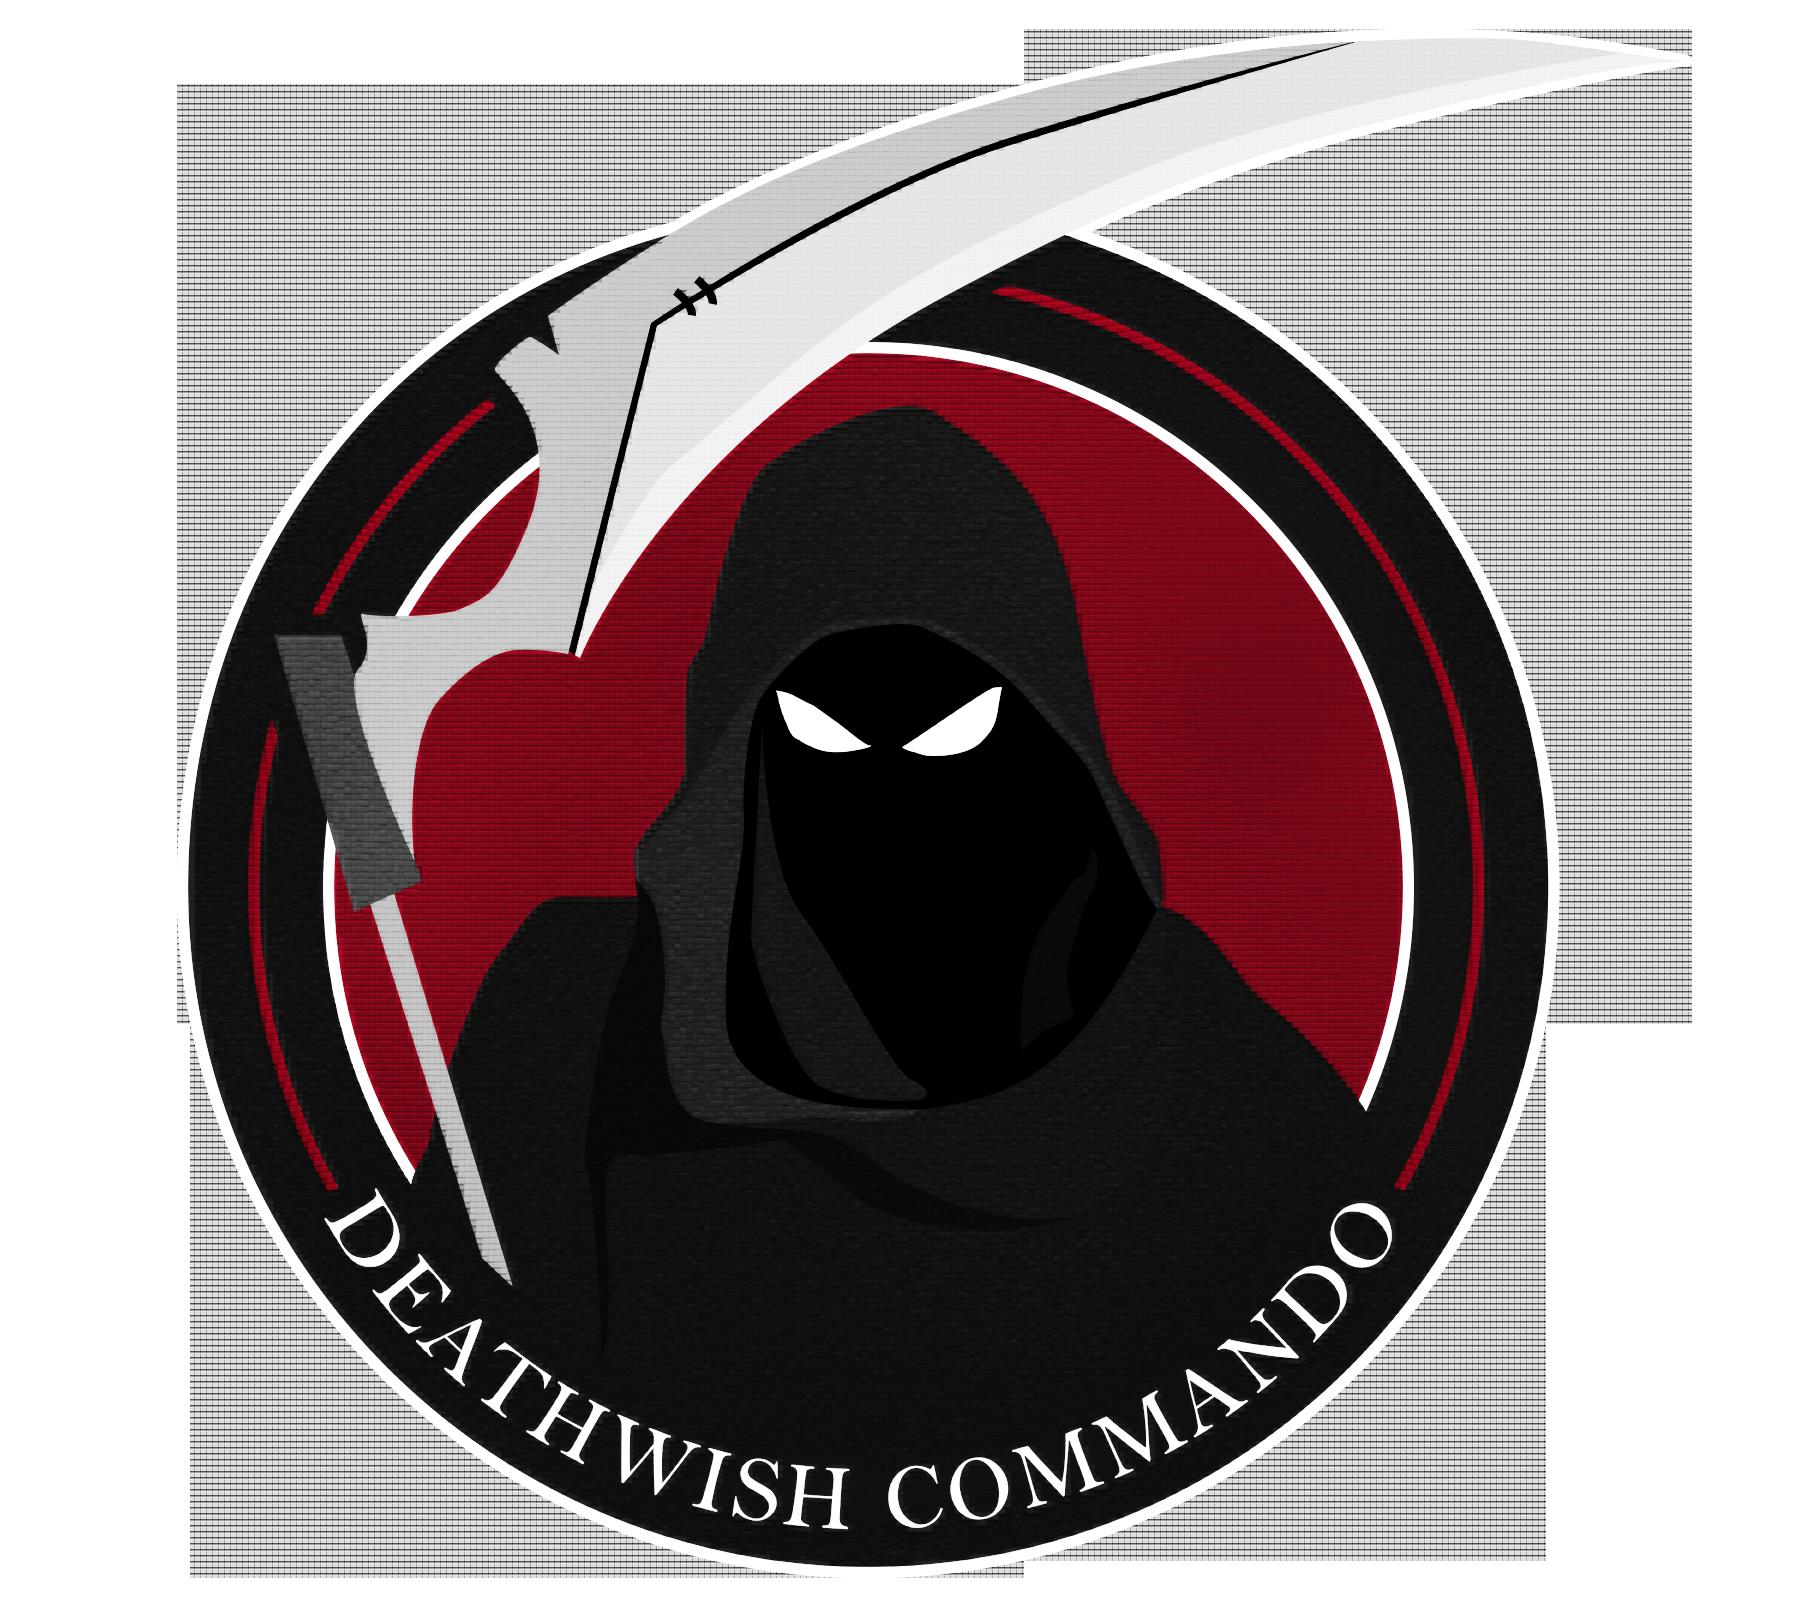 [Bild: Logo_Sensenmann_DWC_inkl_Flilter_1.png]